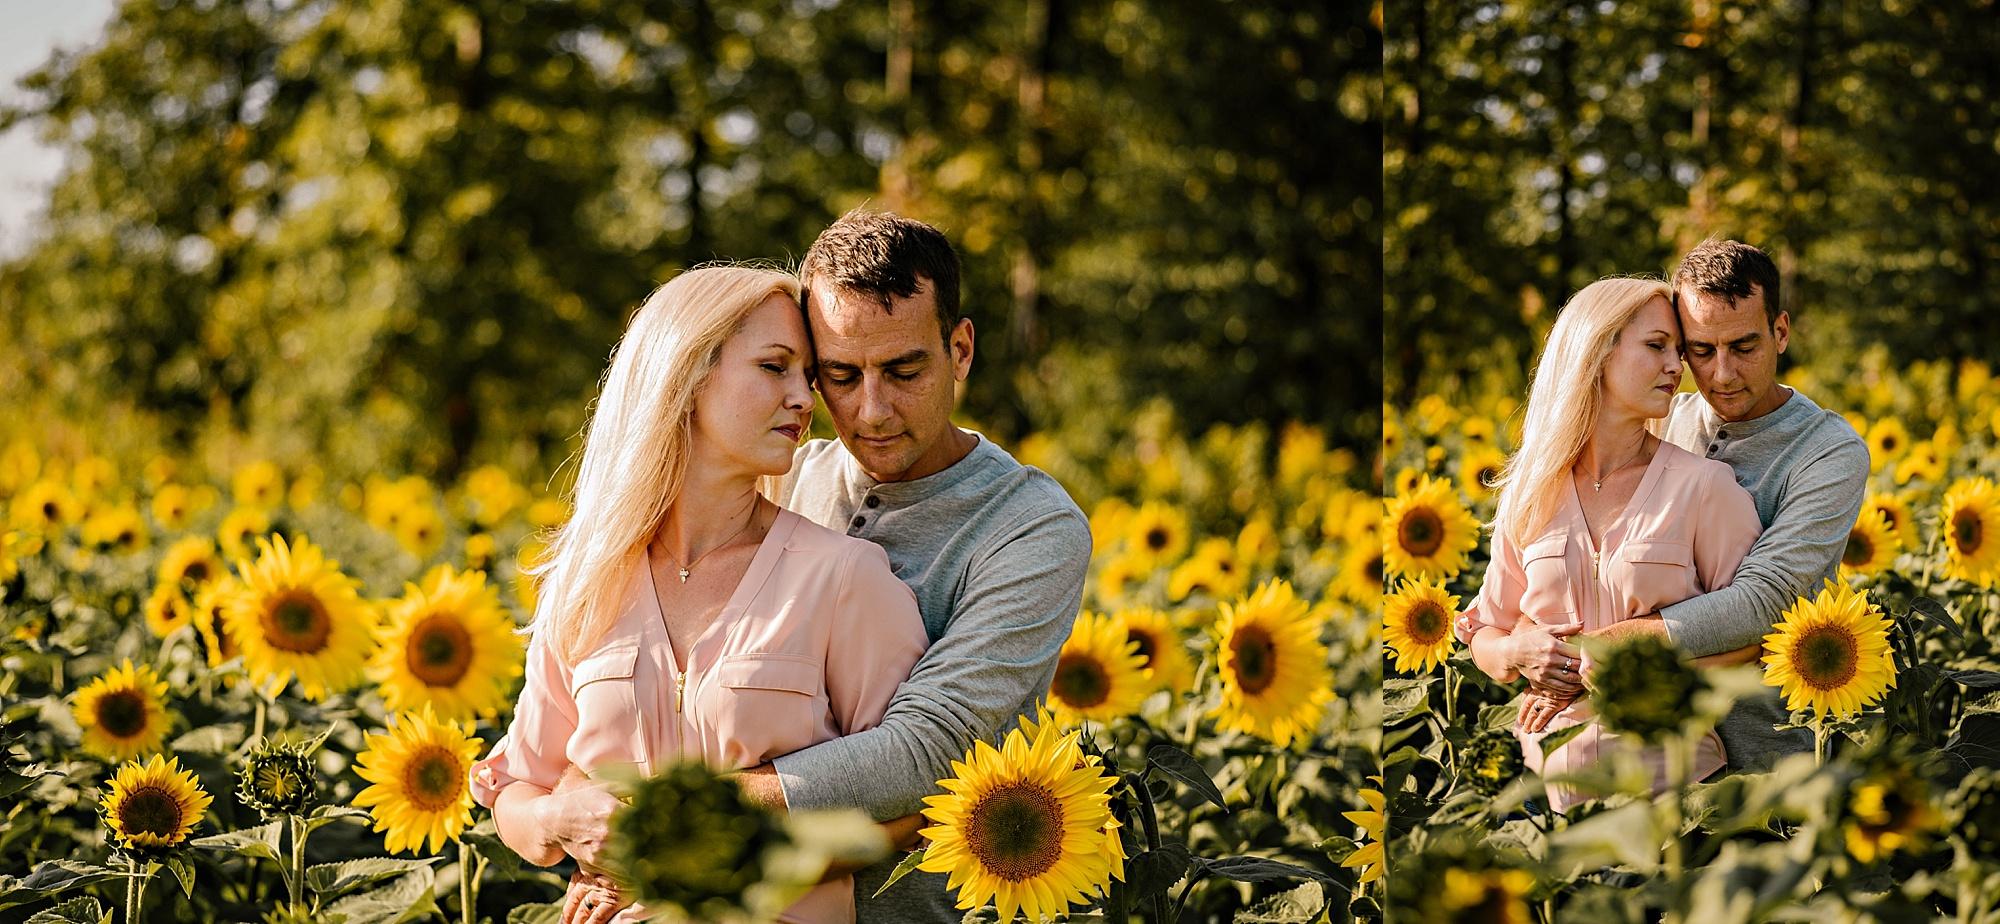 Lori-and-mike-akron-ohio-photographer-lauren-grayson-sunflower-field-session_0005.jpg